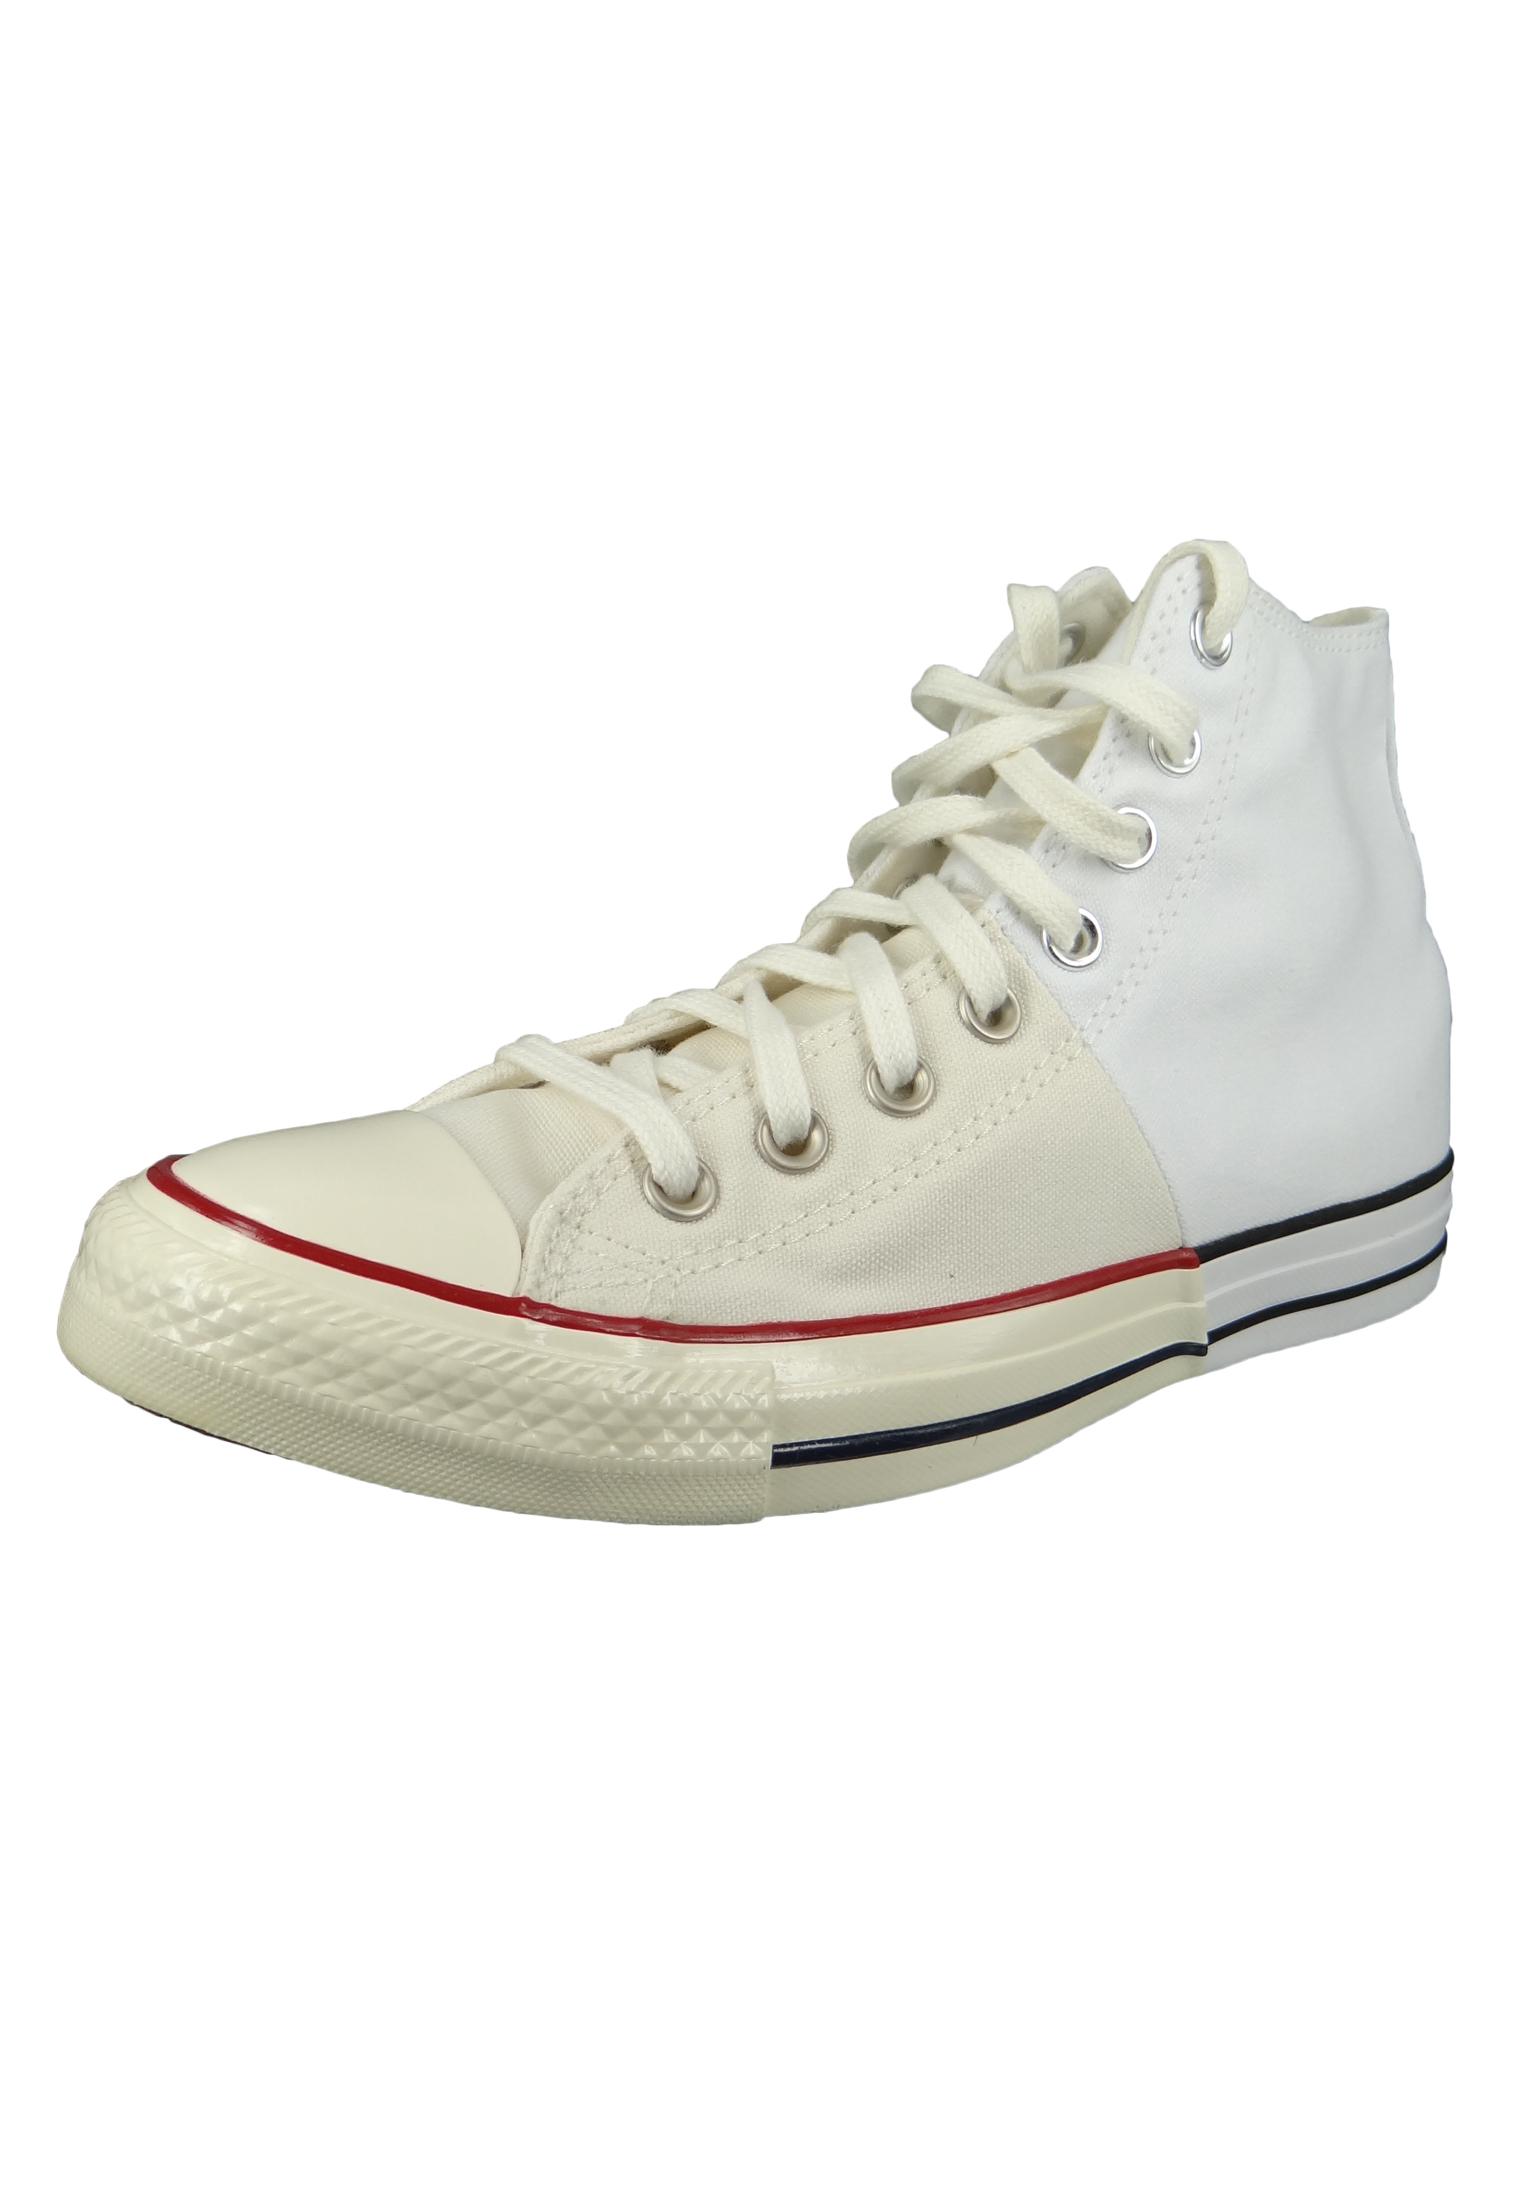 Converse Chucks 163380C Black One Star